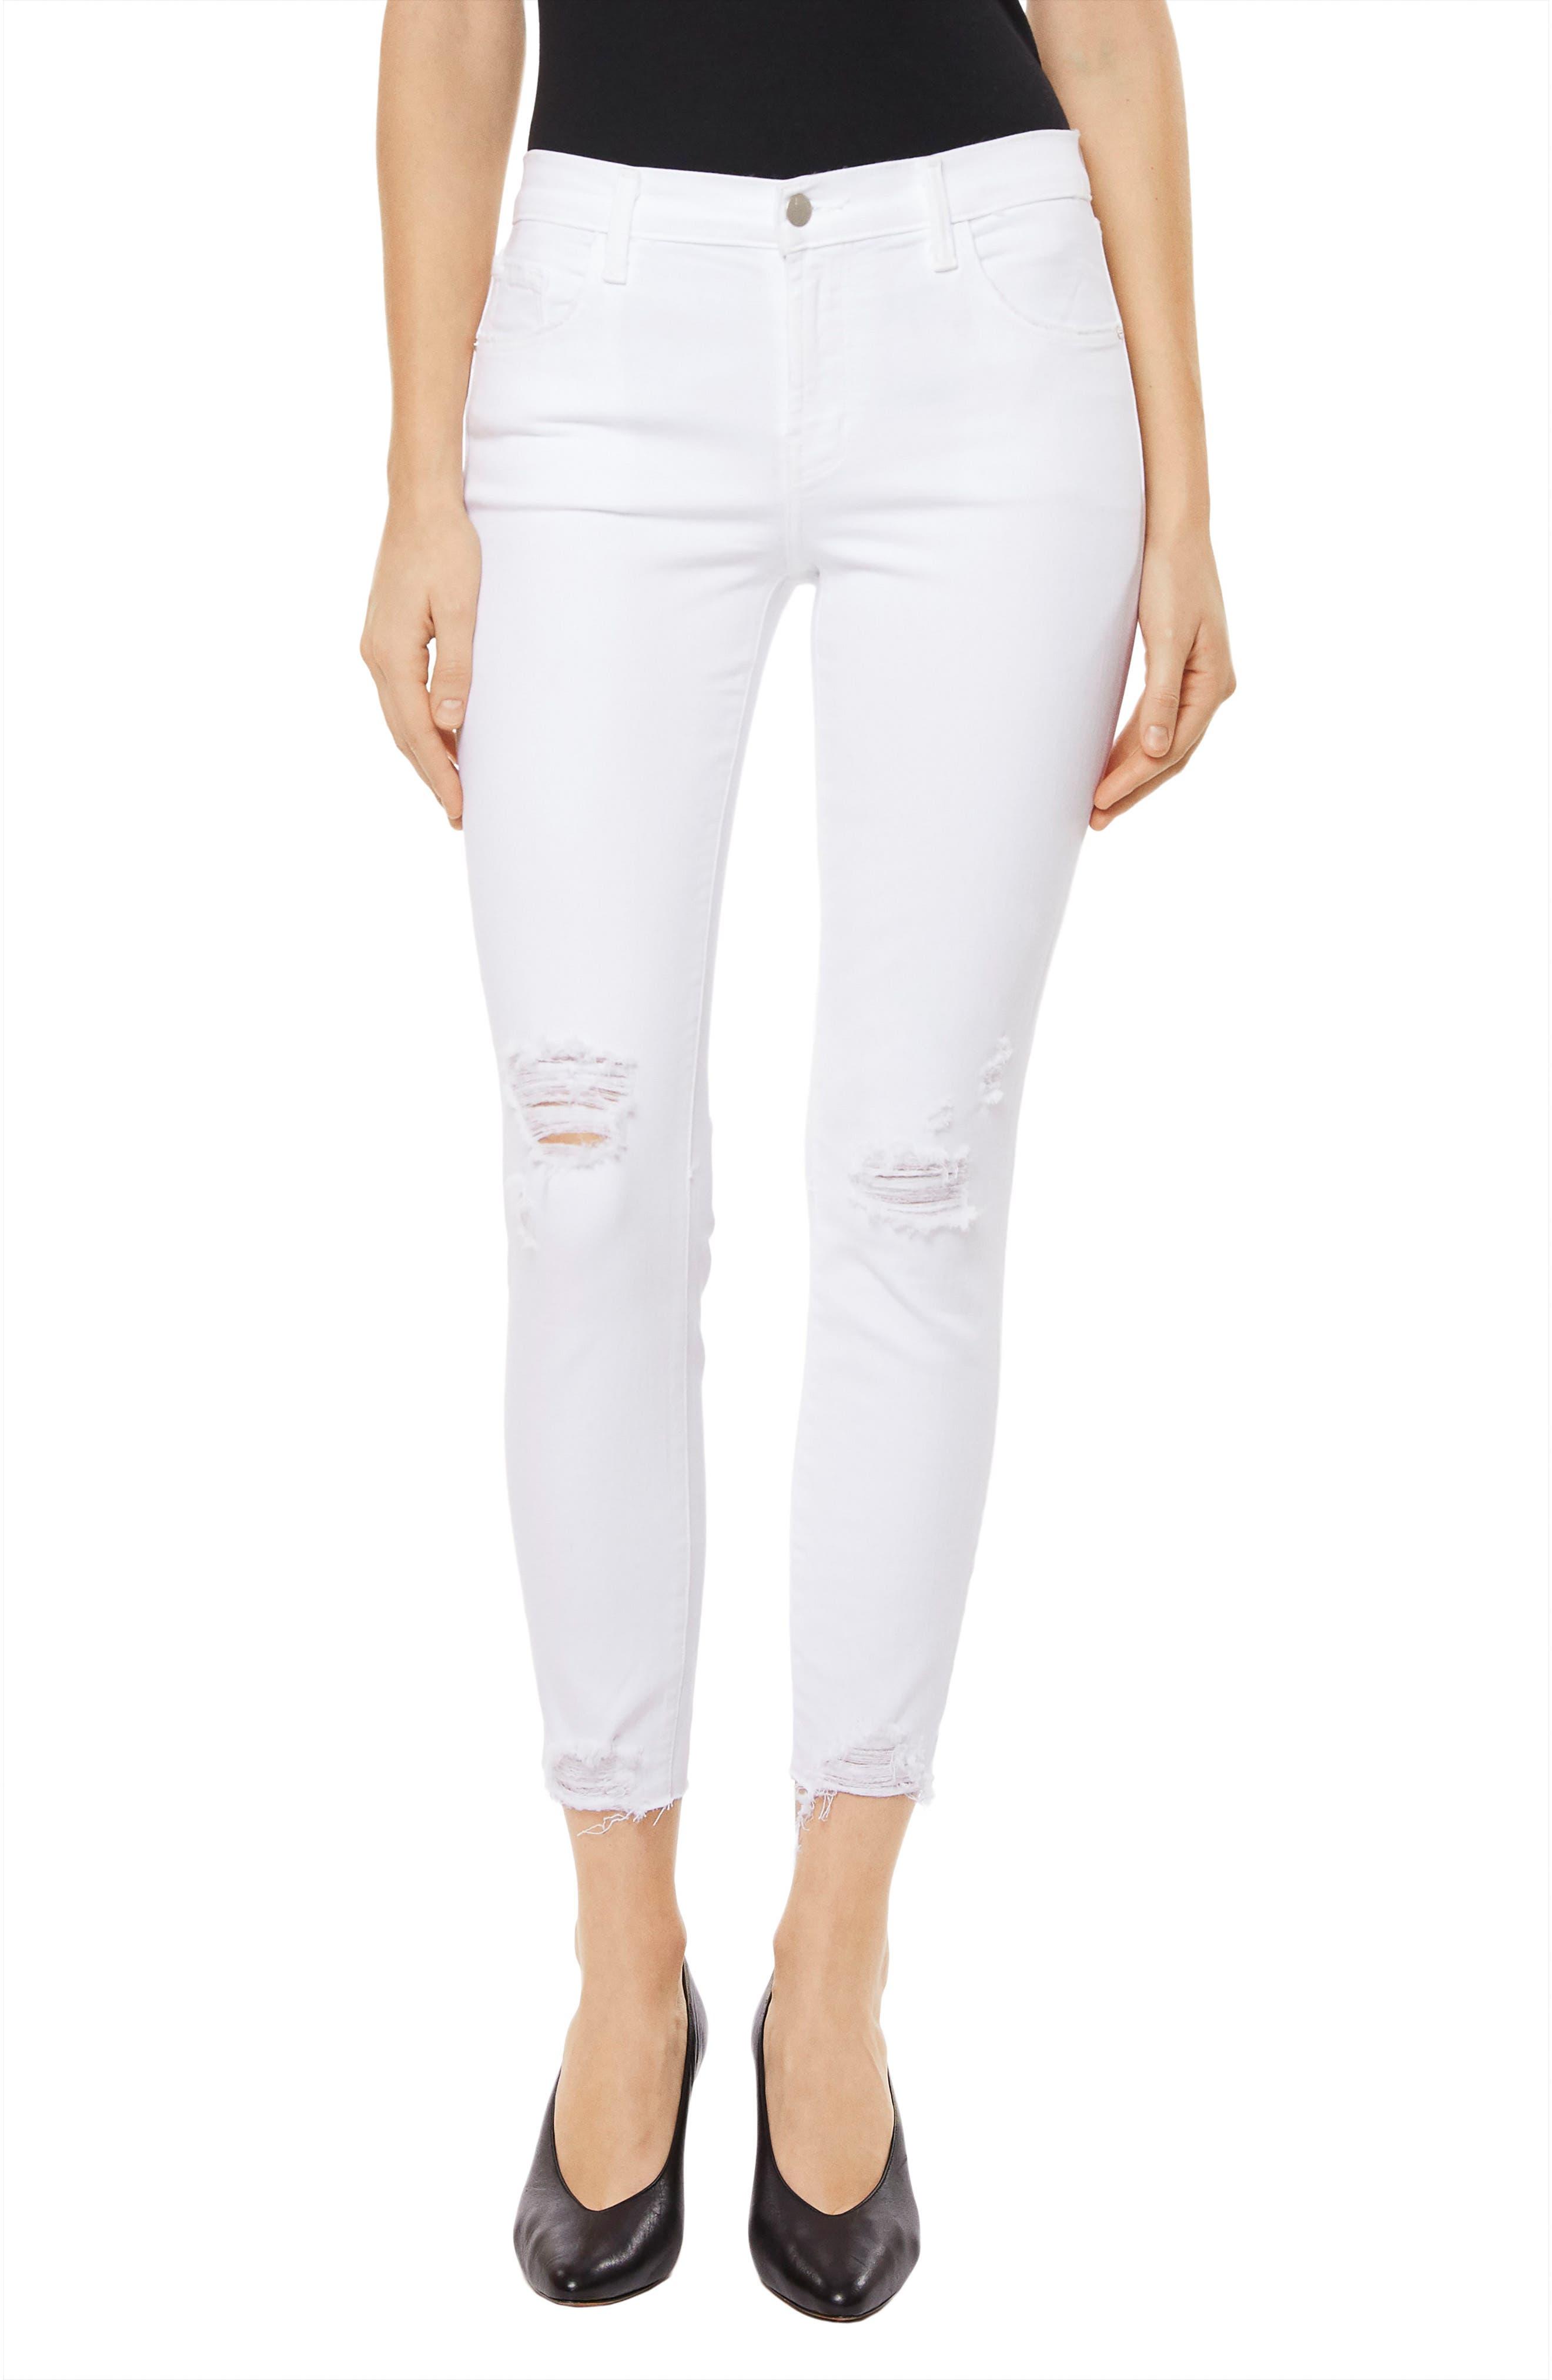 835 Capri Skinny Jeans,                         Main,                         color, Underexposed